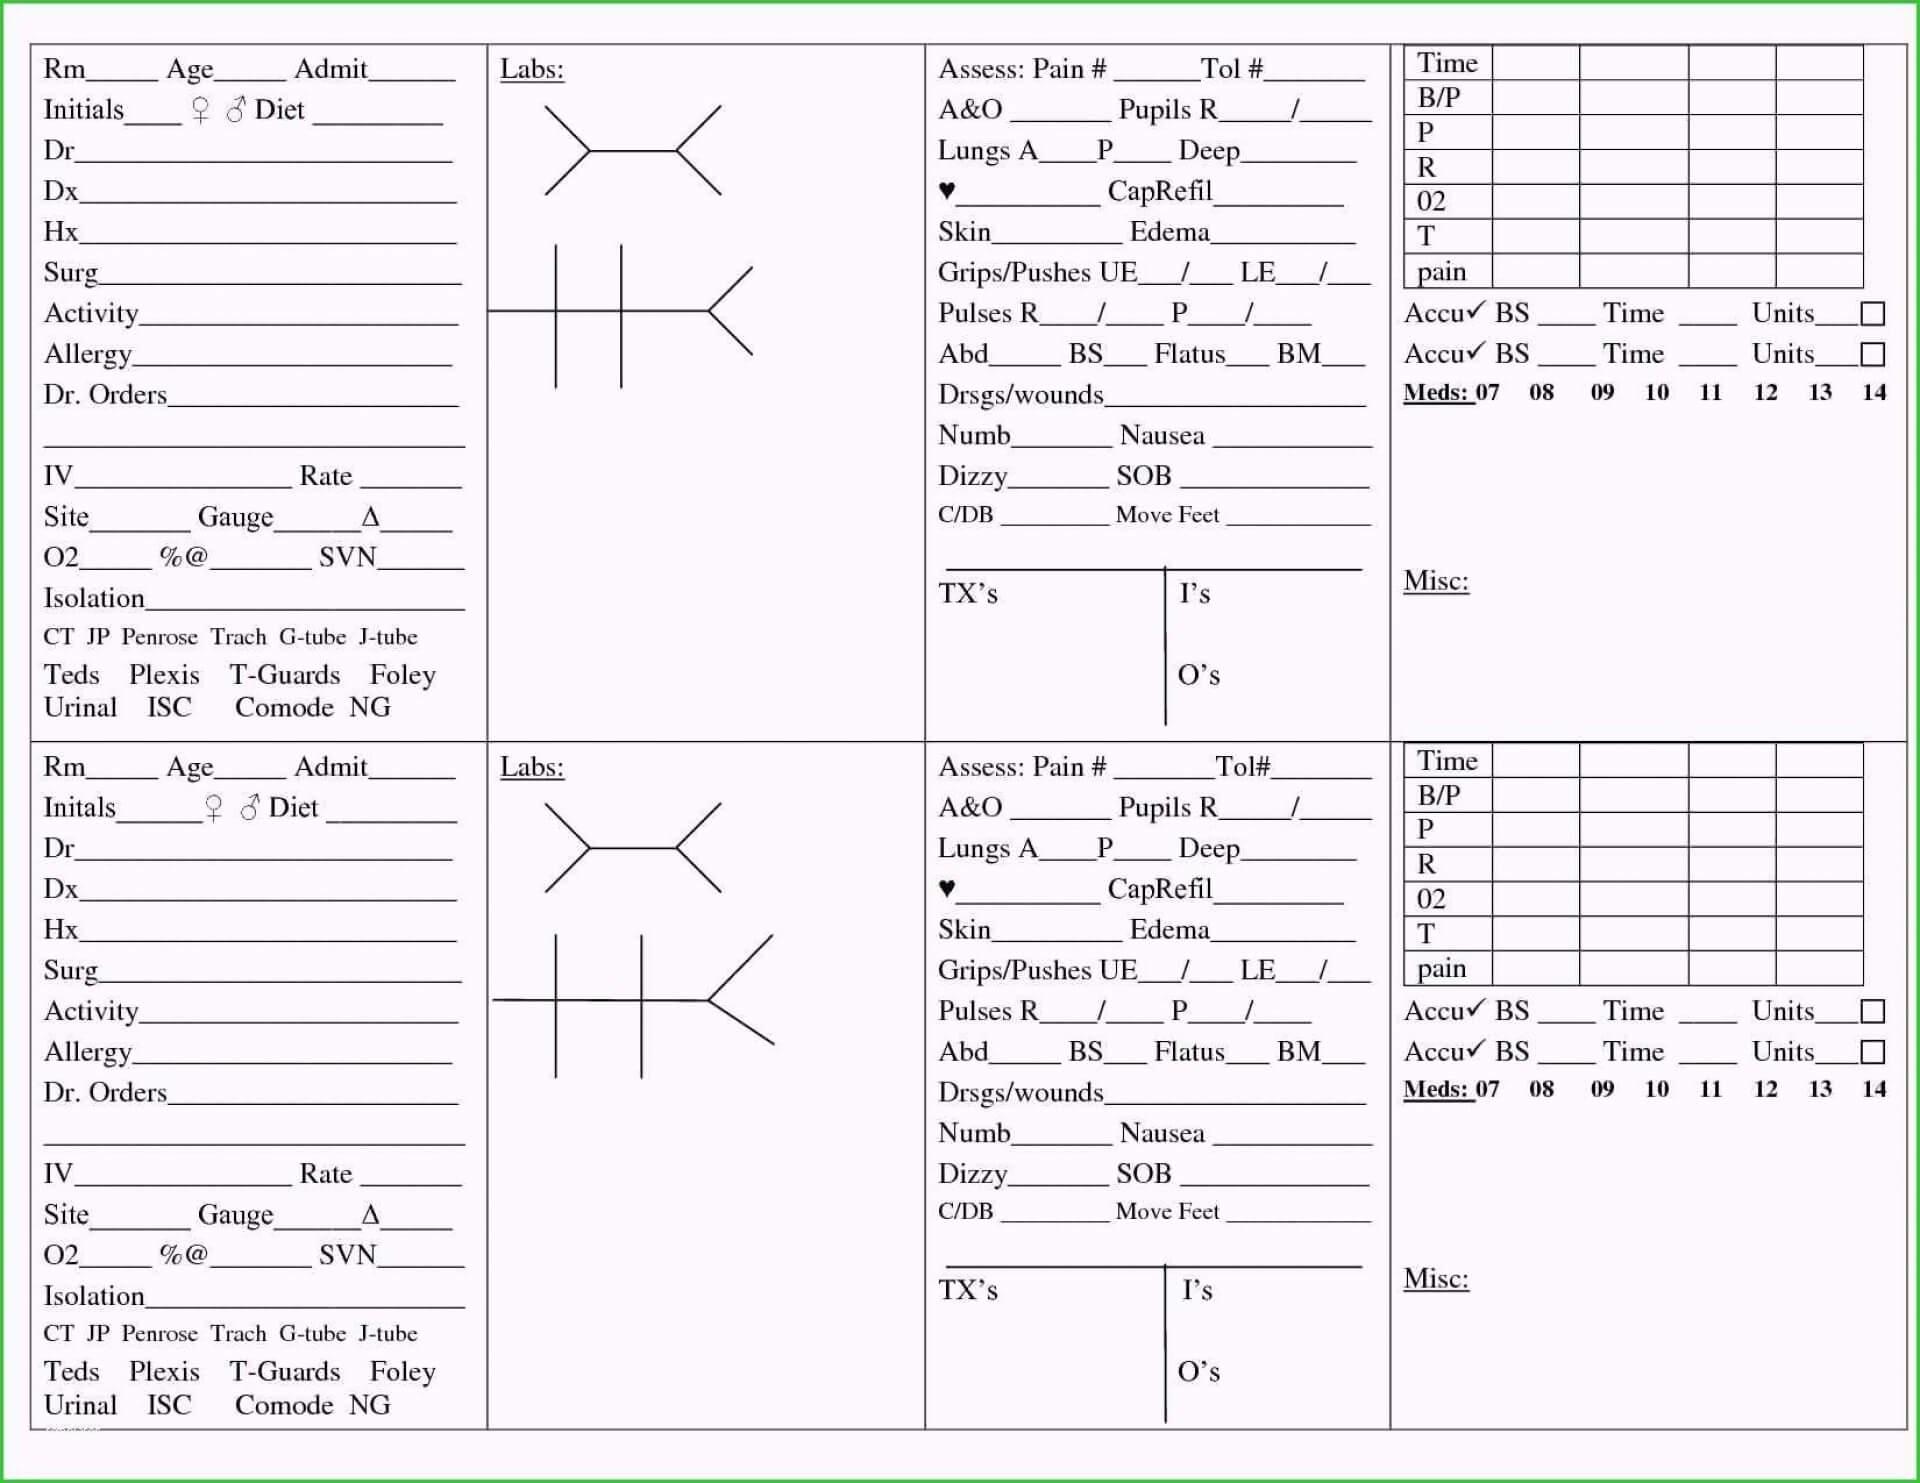 014 Nursing Shift Report Template Unforgettable Ideas Pdf Throughout Nurse Report Template